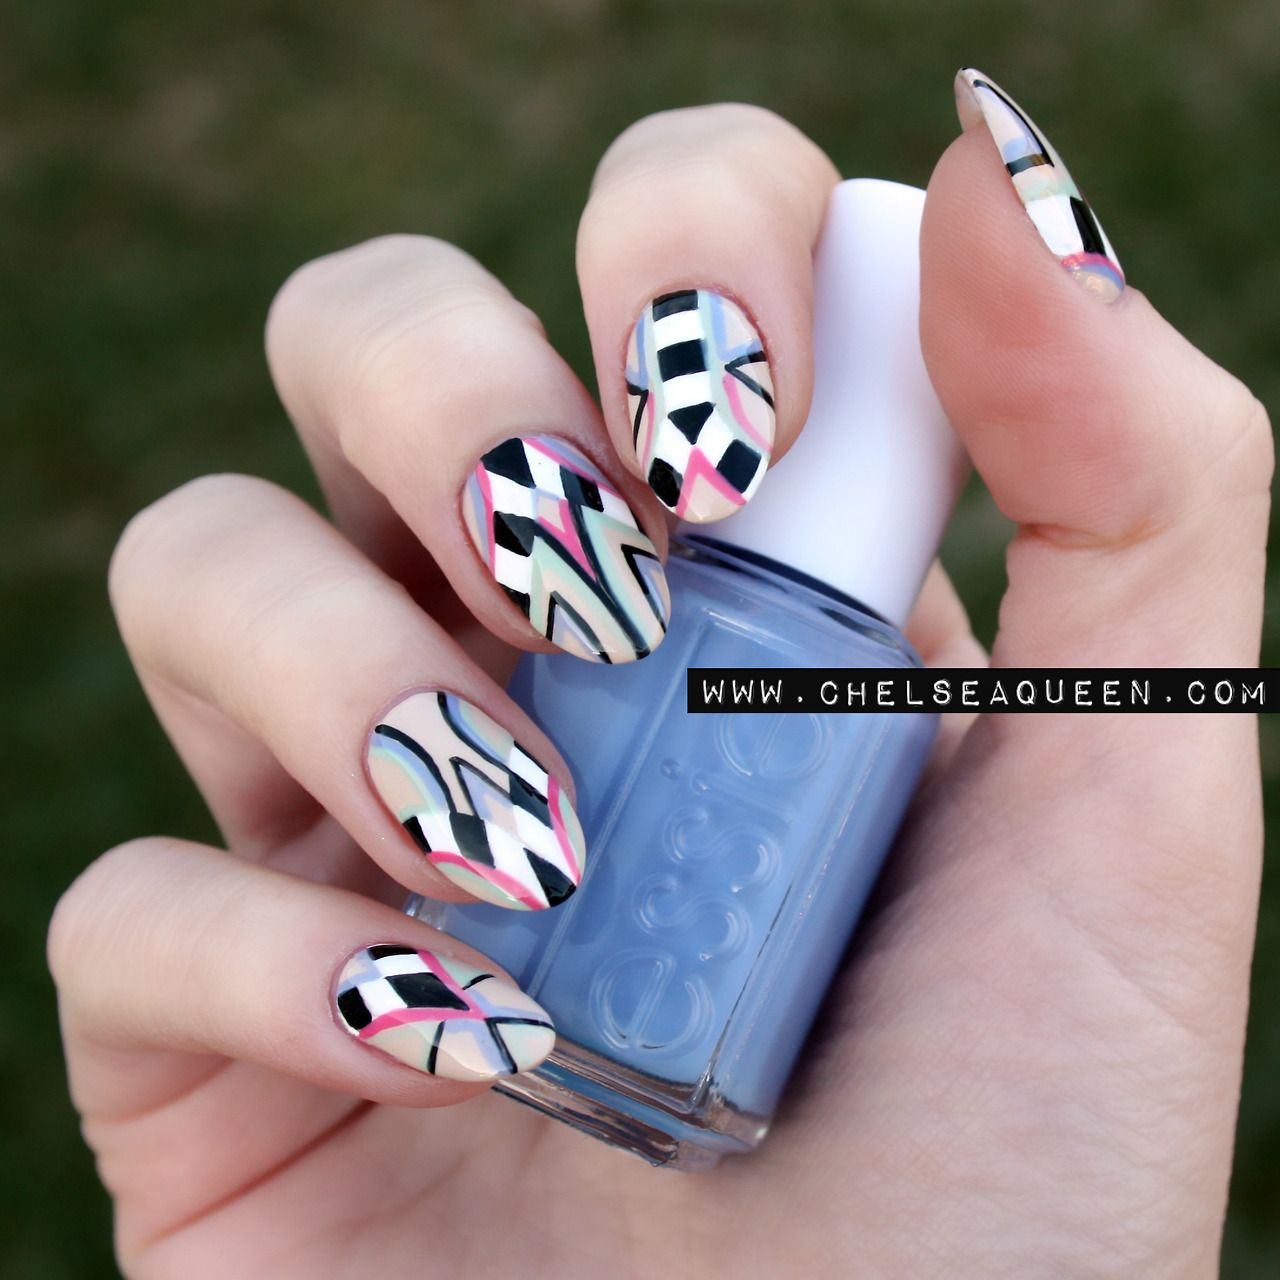 Checkered tribal nails the nail art blogsphere pinterest